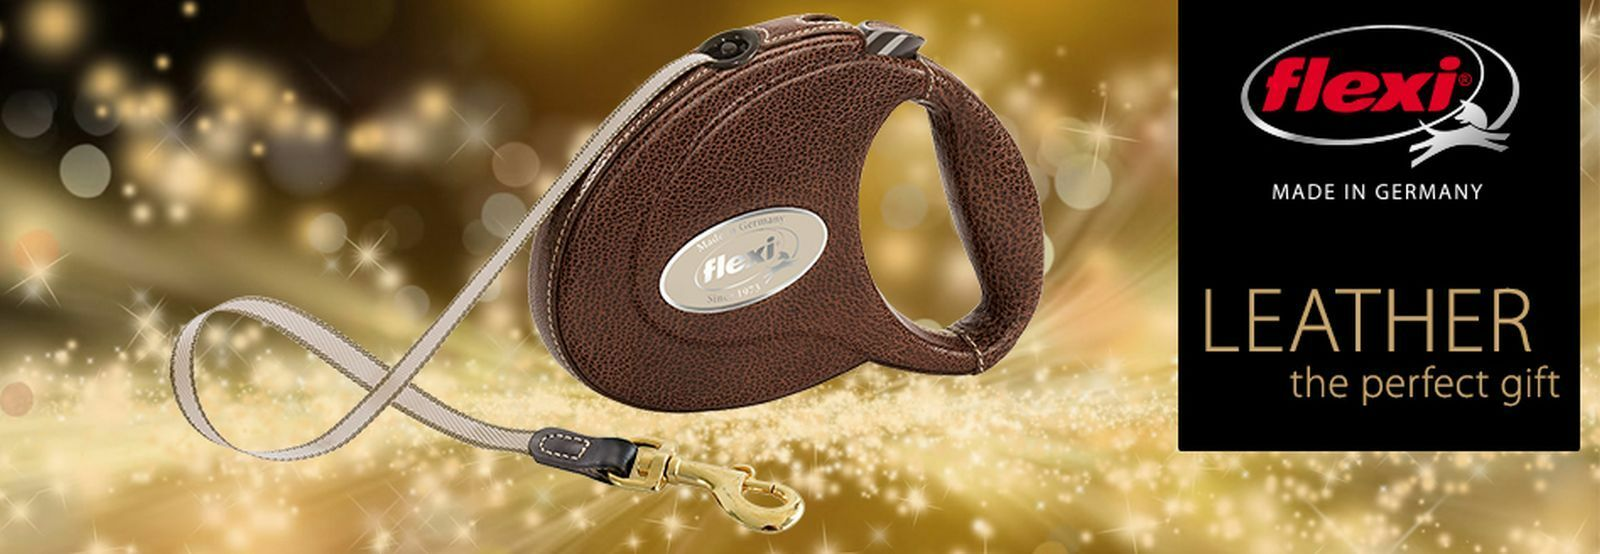 1 flexi Luxury Leder-Gurt-Leine Leder-Gurt-Leine Leder-Gurt-Leine bis 25 kg 5 Meter Exklusive Leine in schwarz    Großer Verkauf  94fb7b